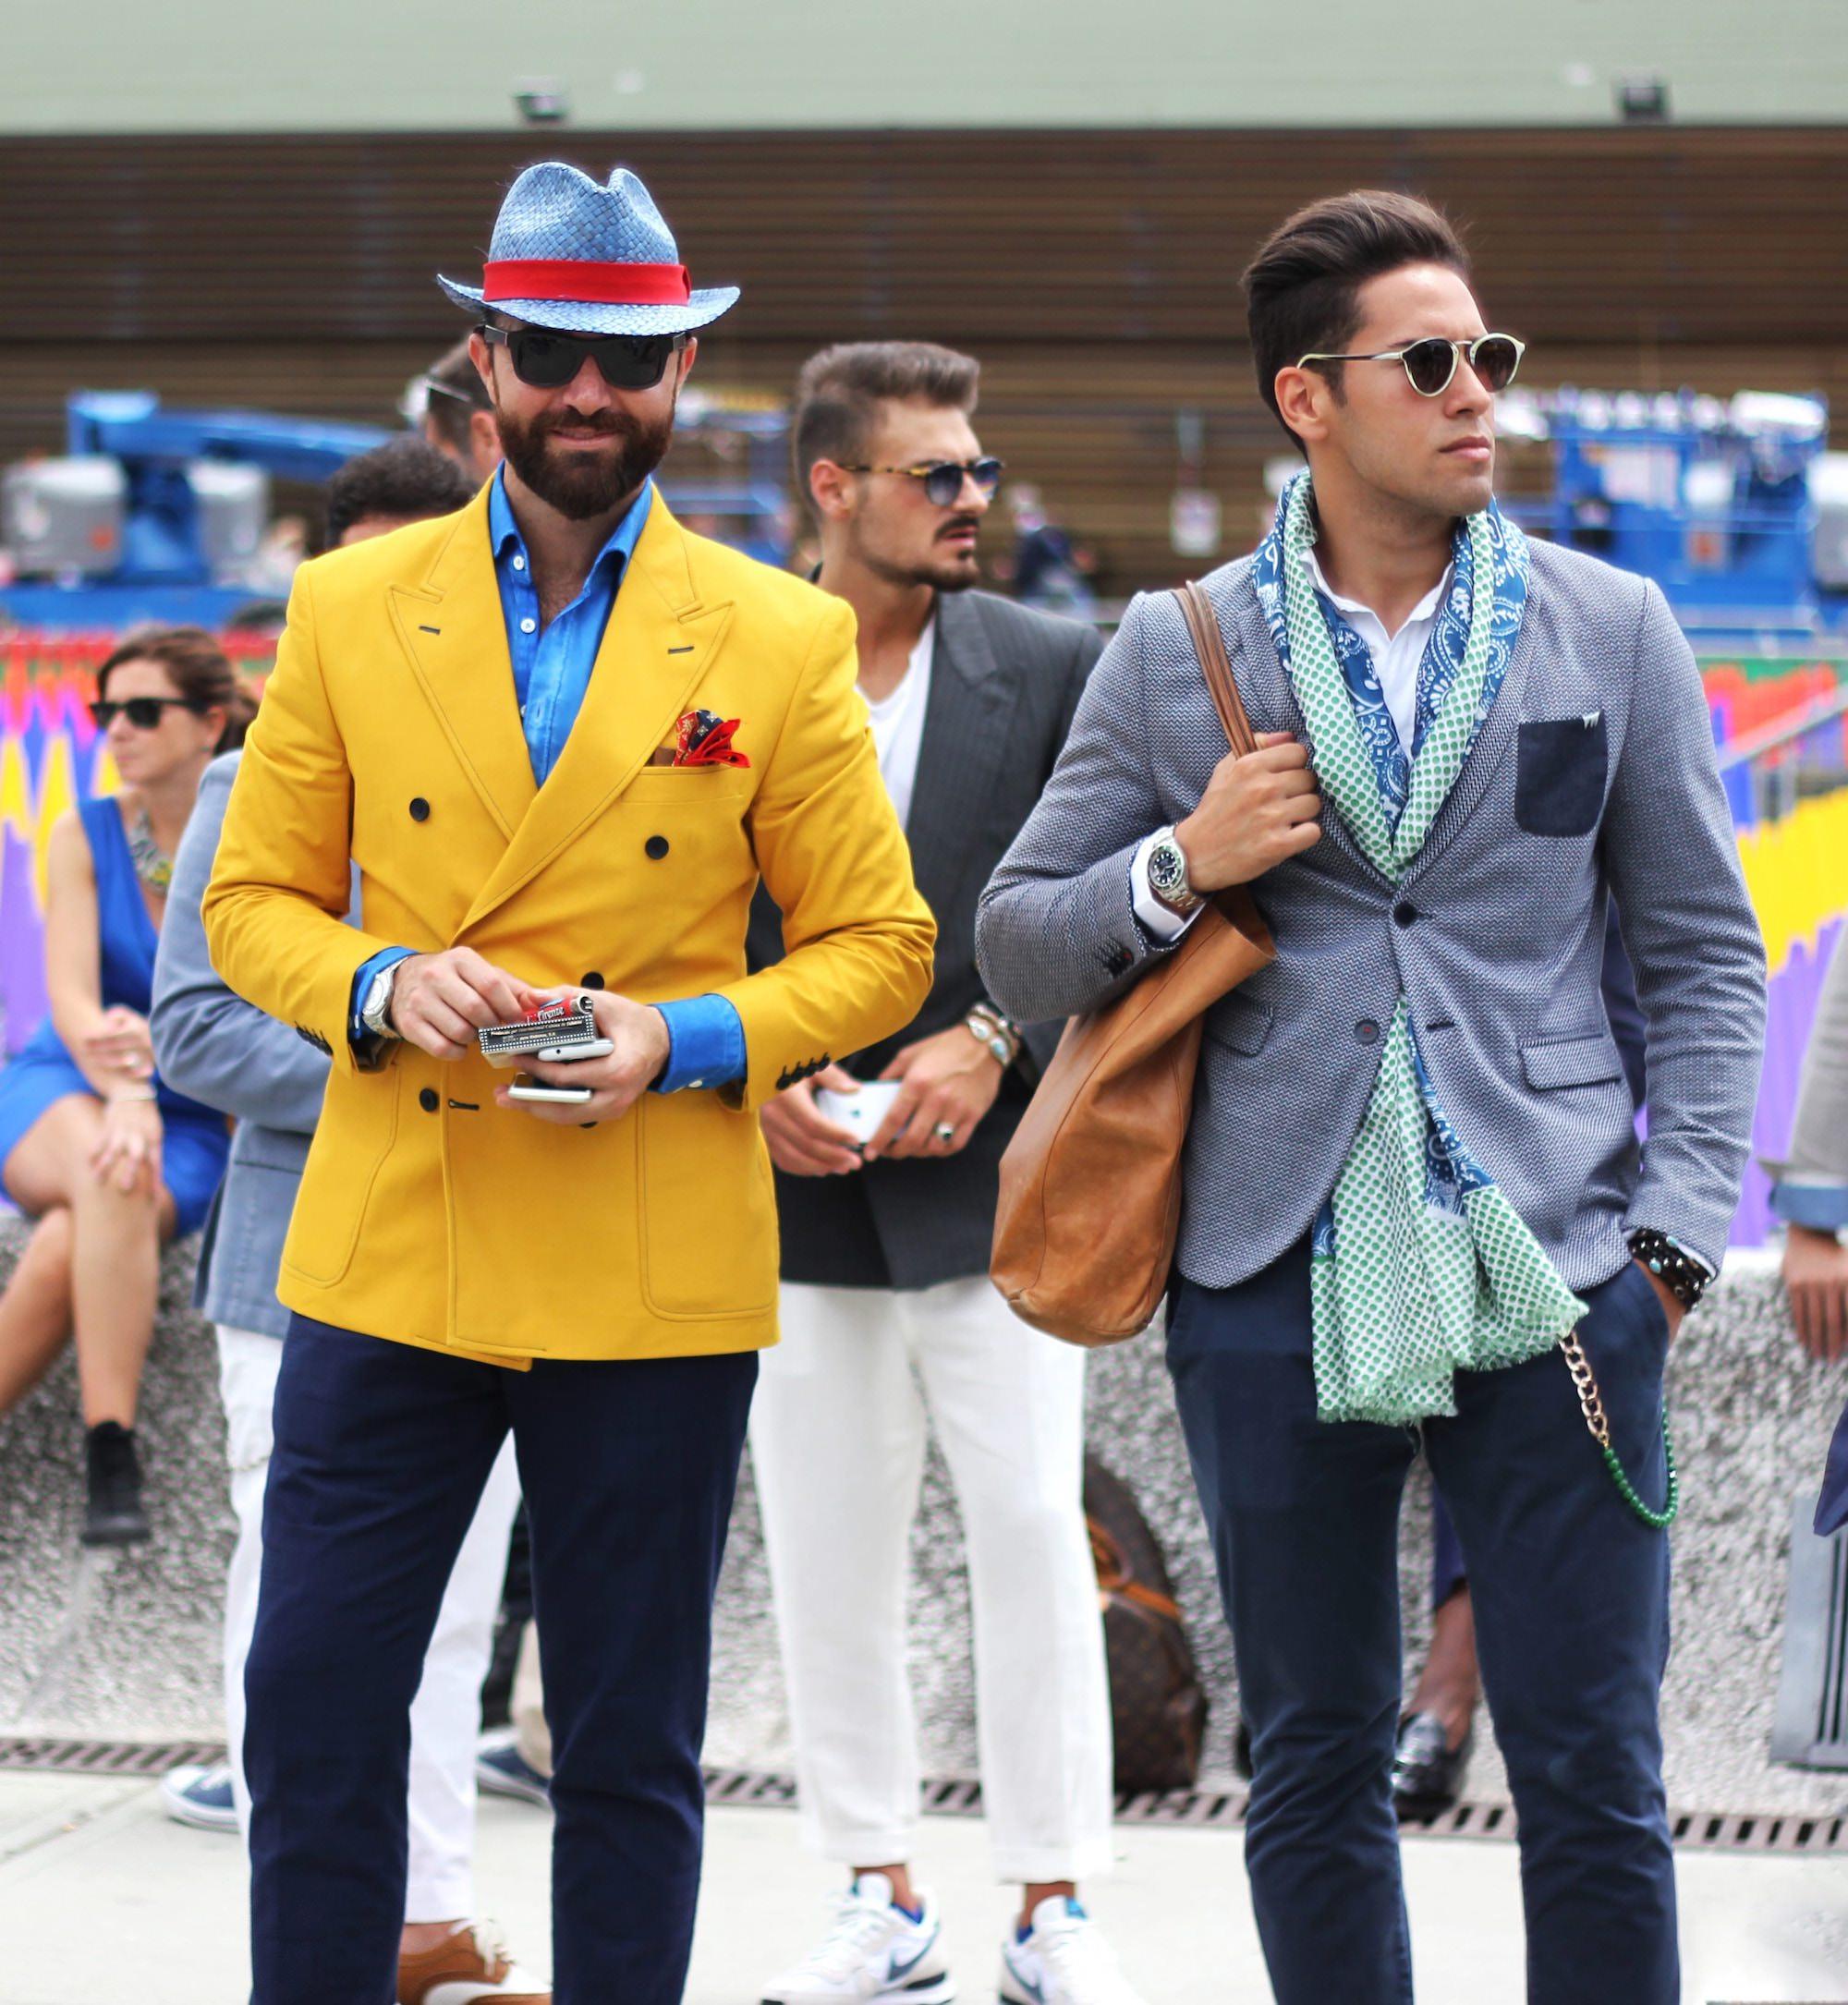 pitti uomo yellow jacket style men hat scarf bag blue